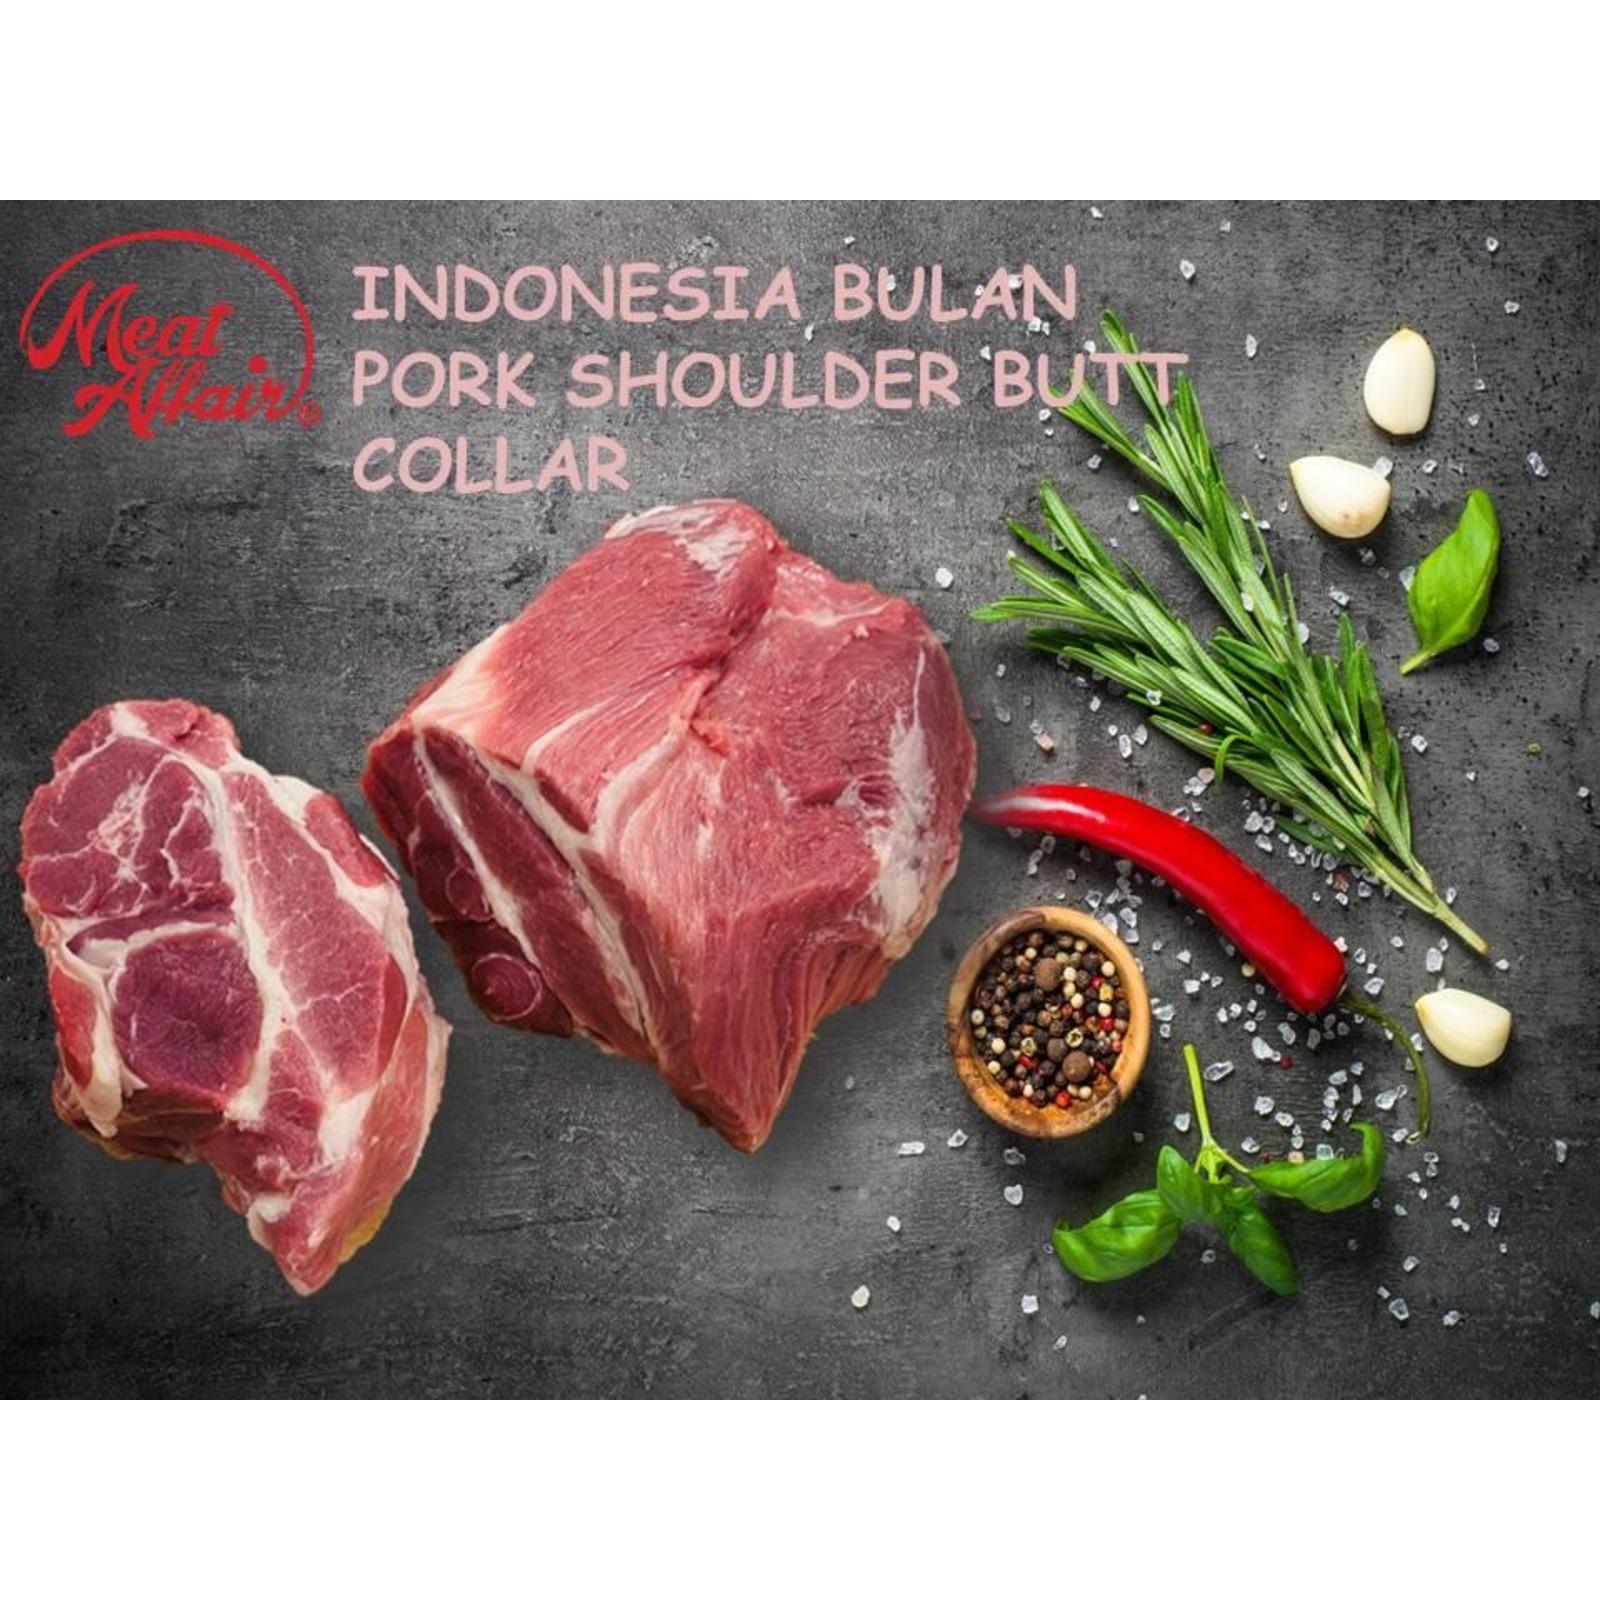 Meat Affair Indonesia Pork Shoulder Butt, Collar